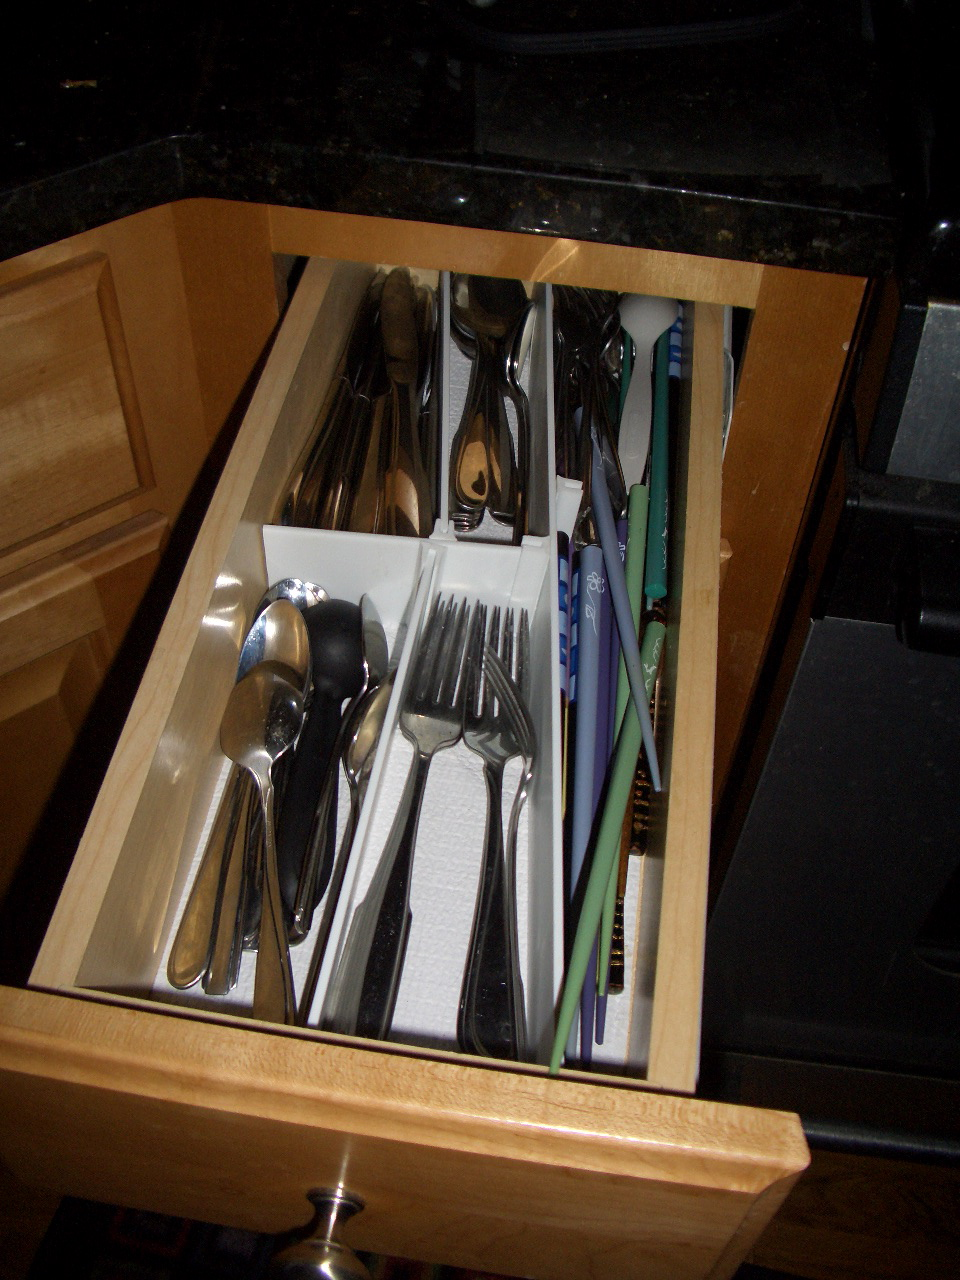 small drawer cutlery tray stdja besteckkasten ikea rev a. Black Bedroom Furniture Sets. Home Design Ideas